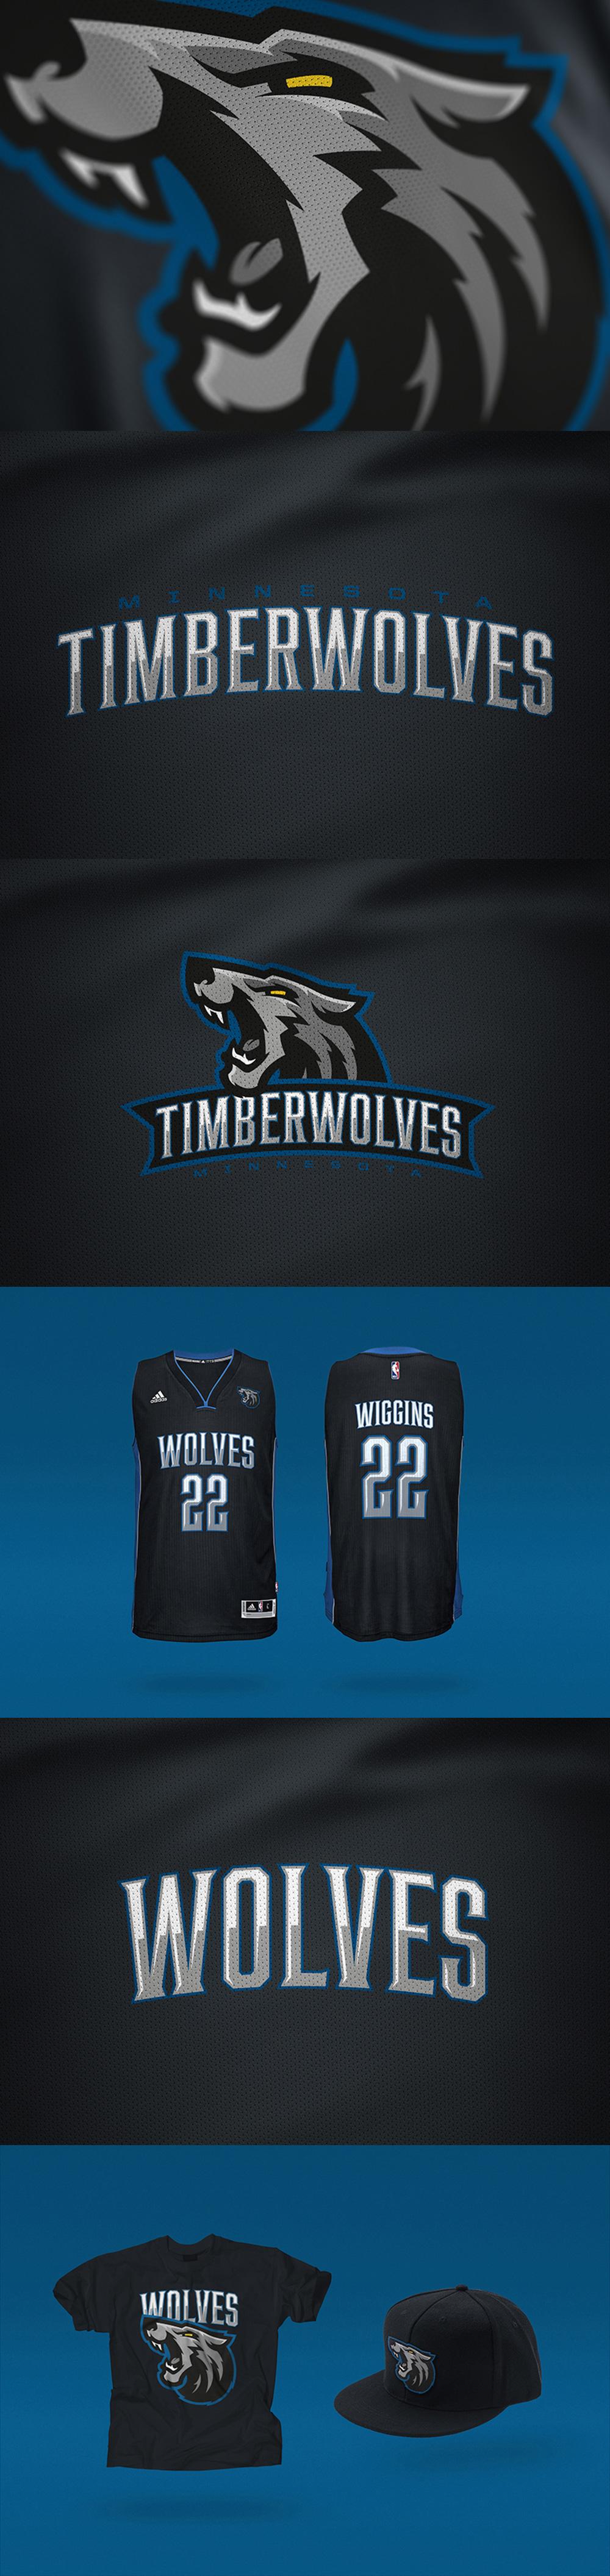 Logotipo del equipo de basketball: Minnesota Timberwolves Rebrand Concept de Miika Kumpulainen